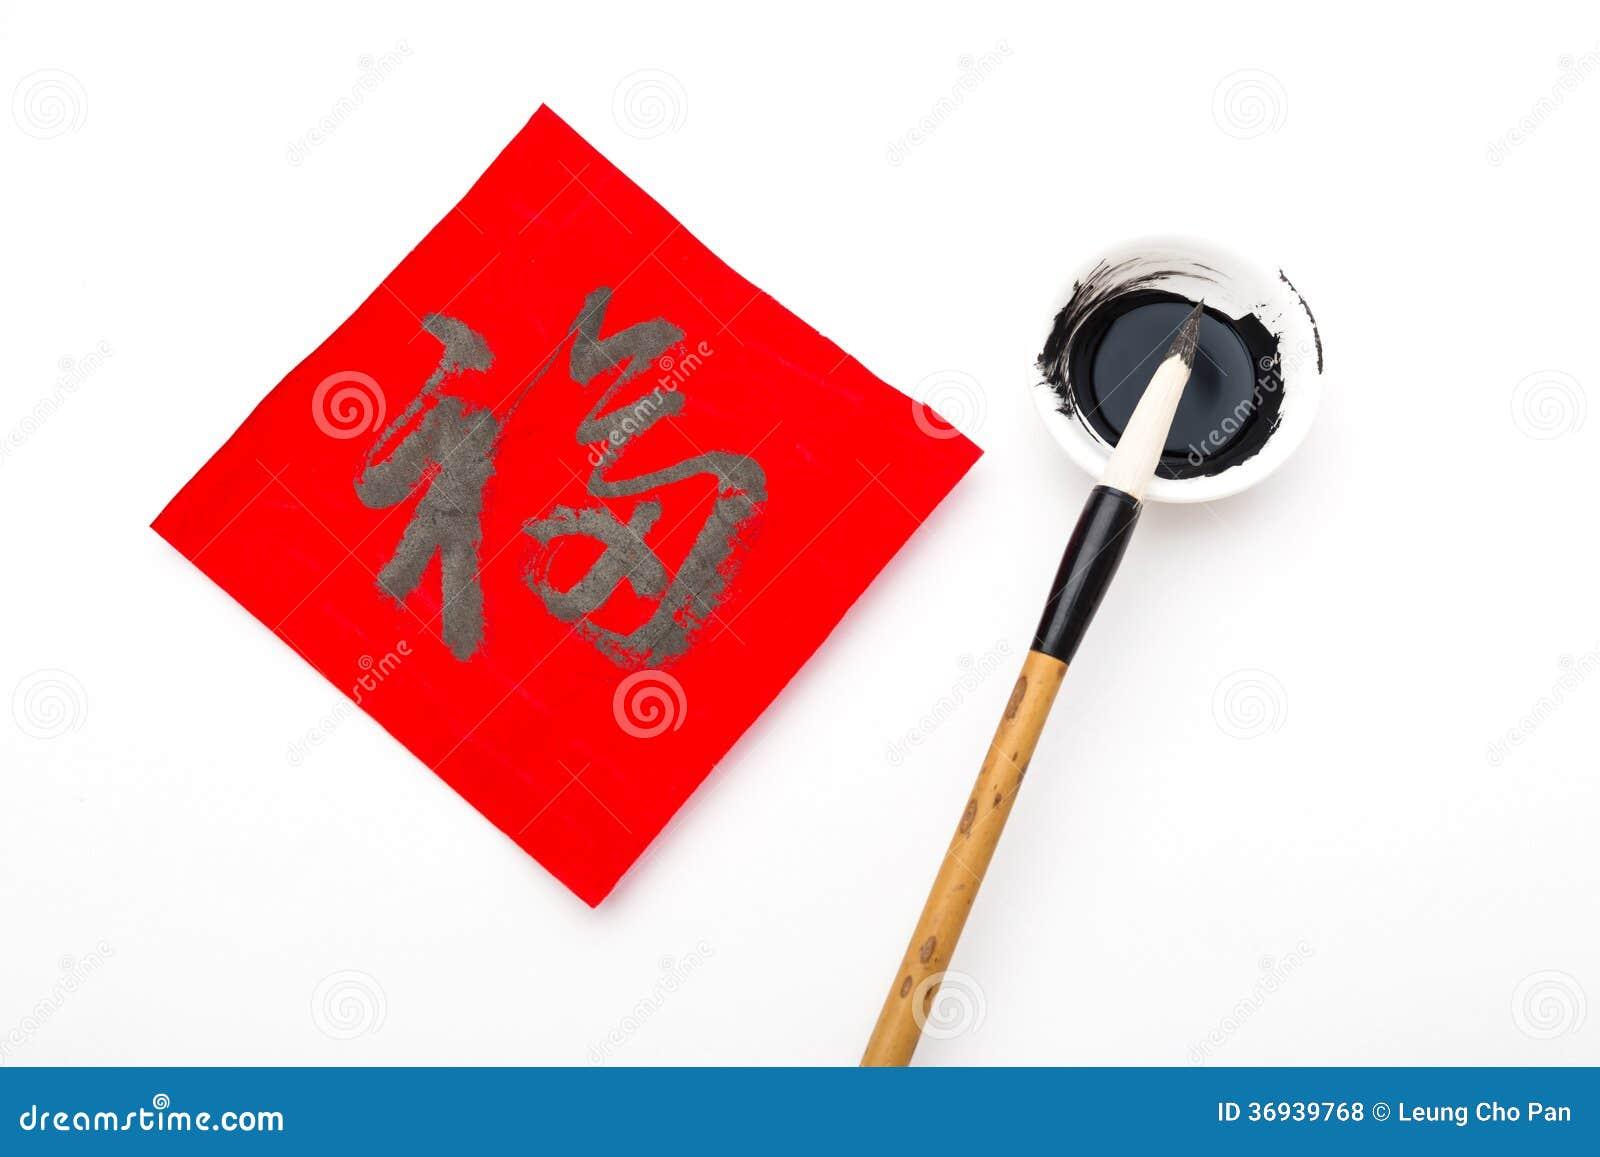 Vietnam: Lunar New Year Festival Essay Sample